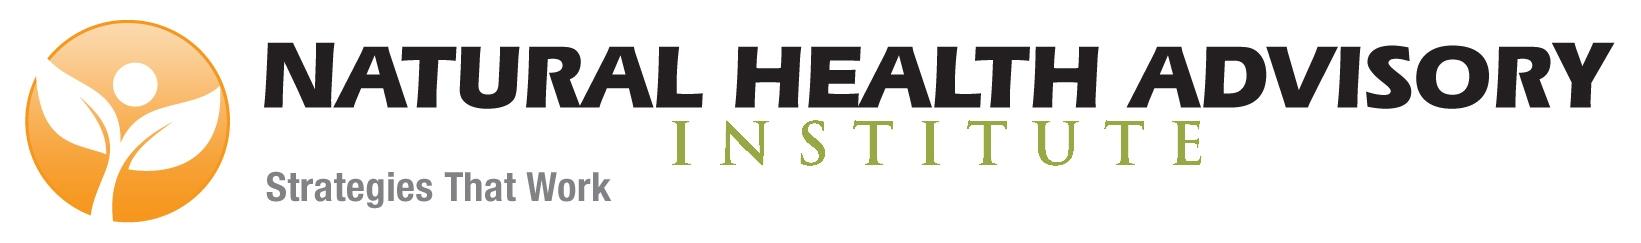 Natural Health Advisory Institute